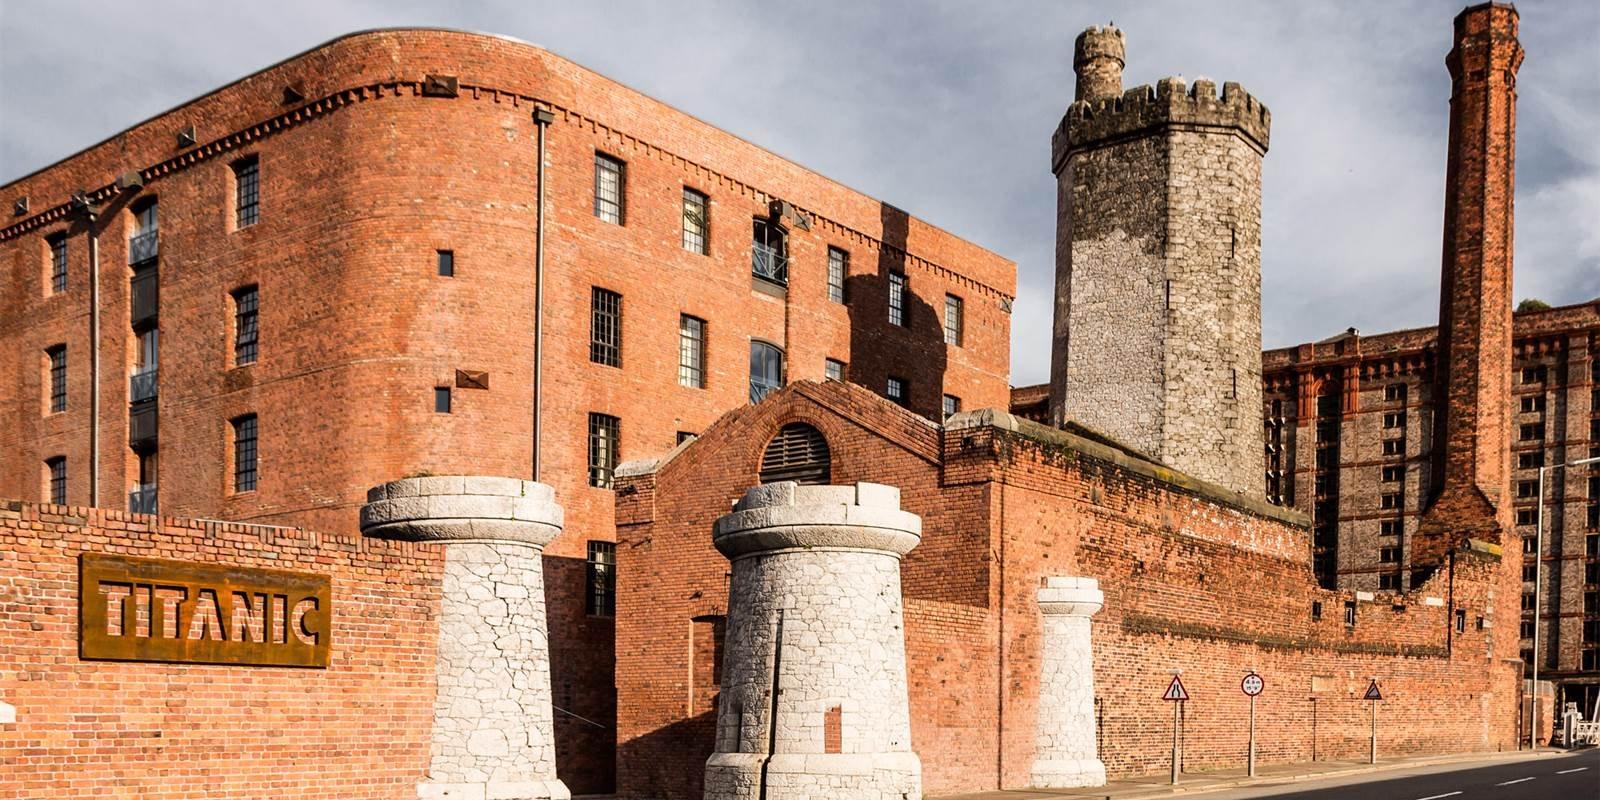 Our amazing venue - Liverpool's Titanic Hotel